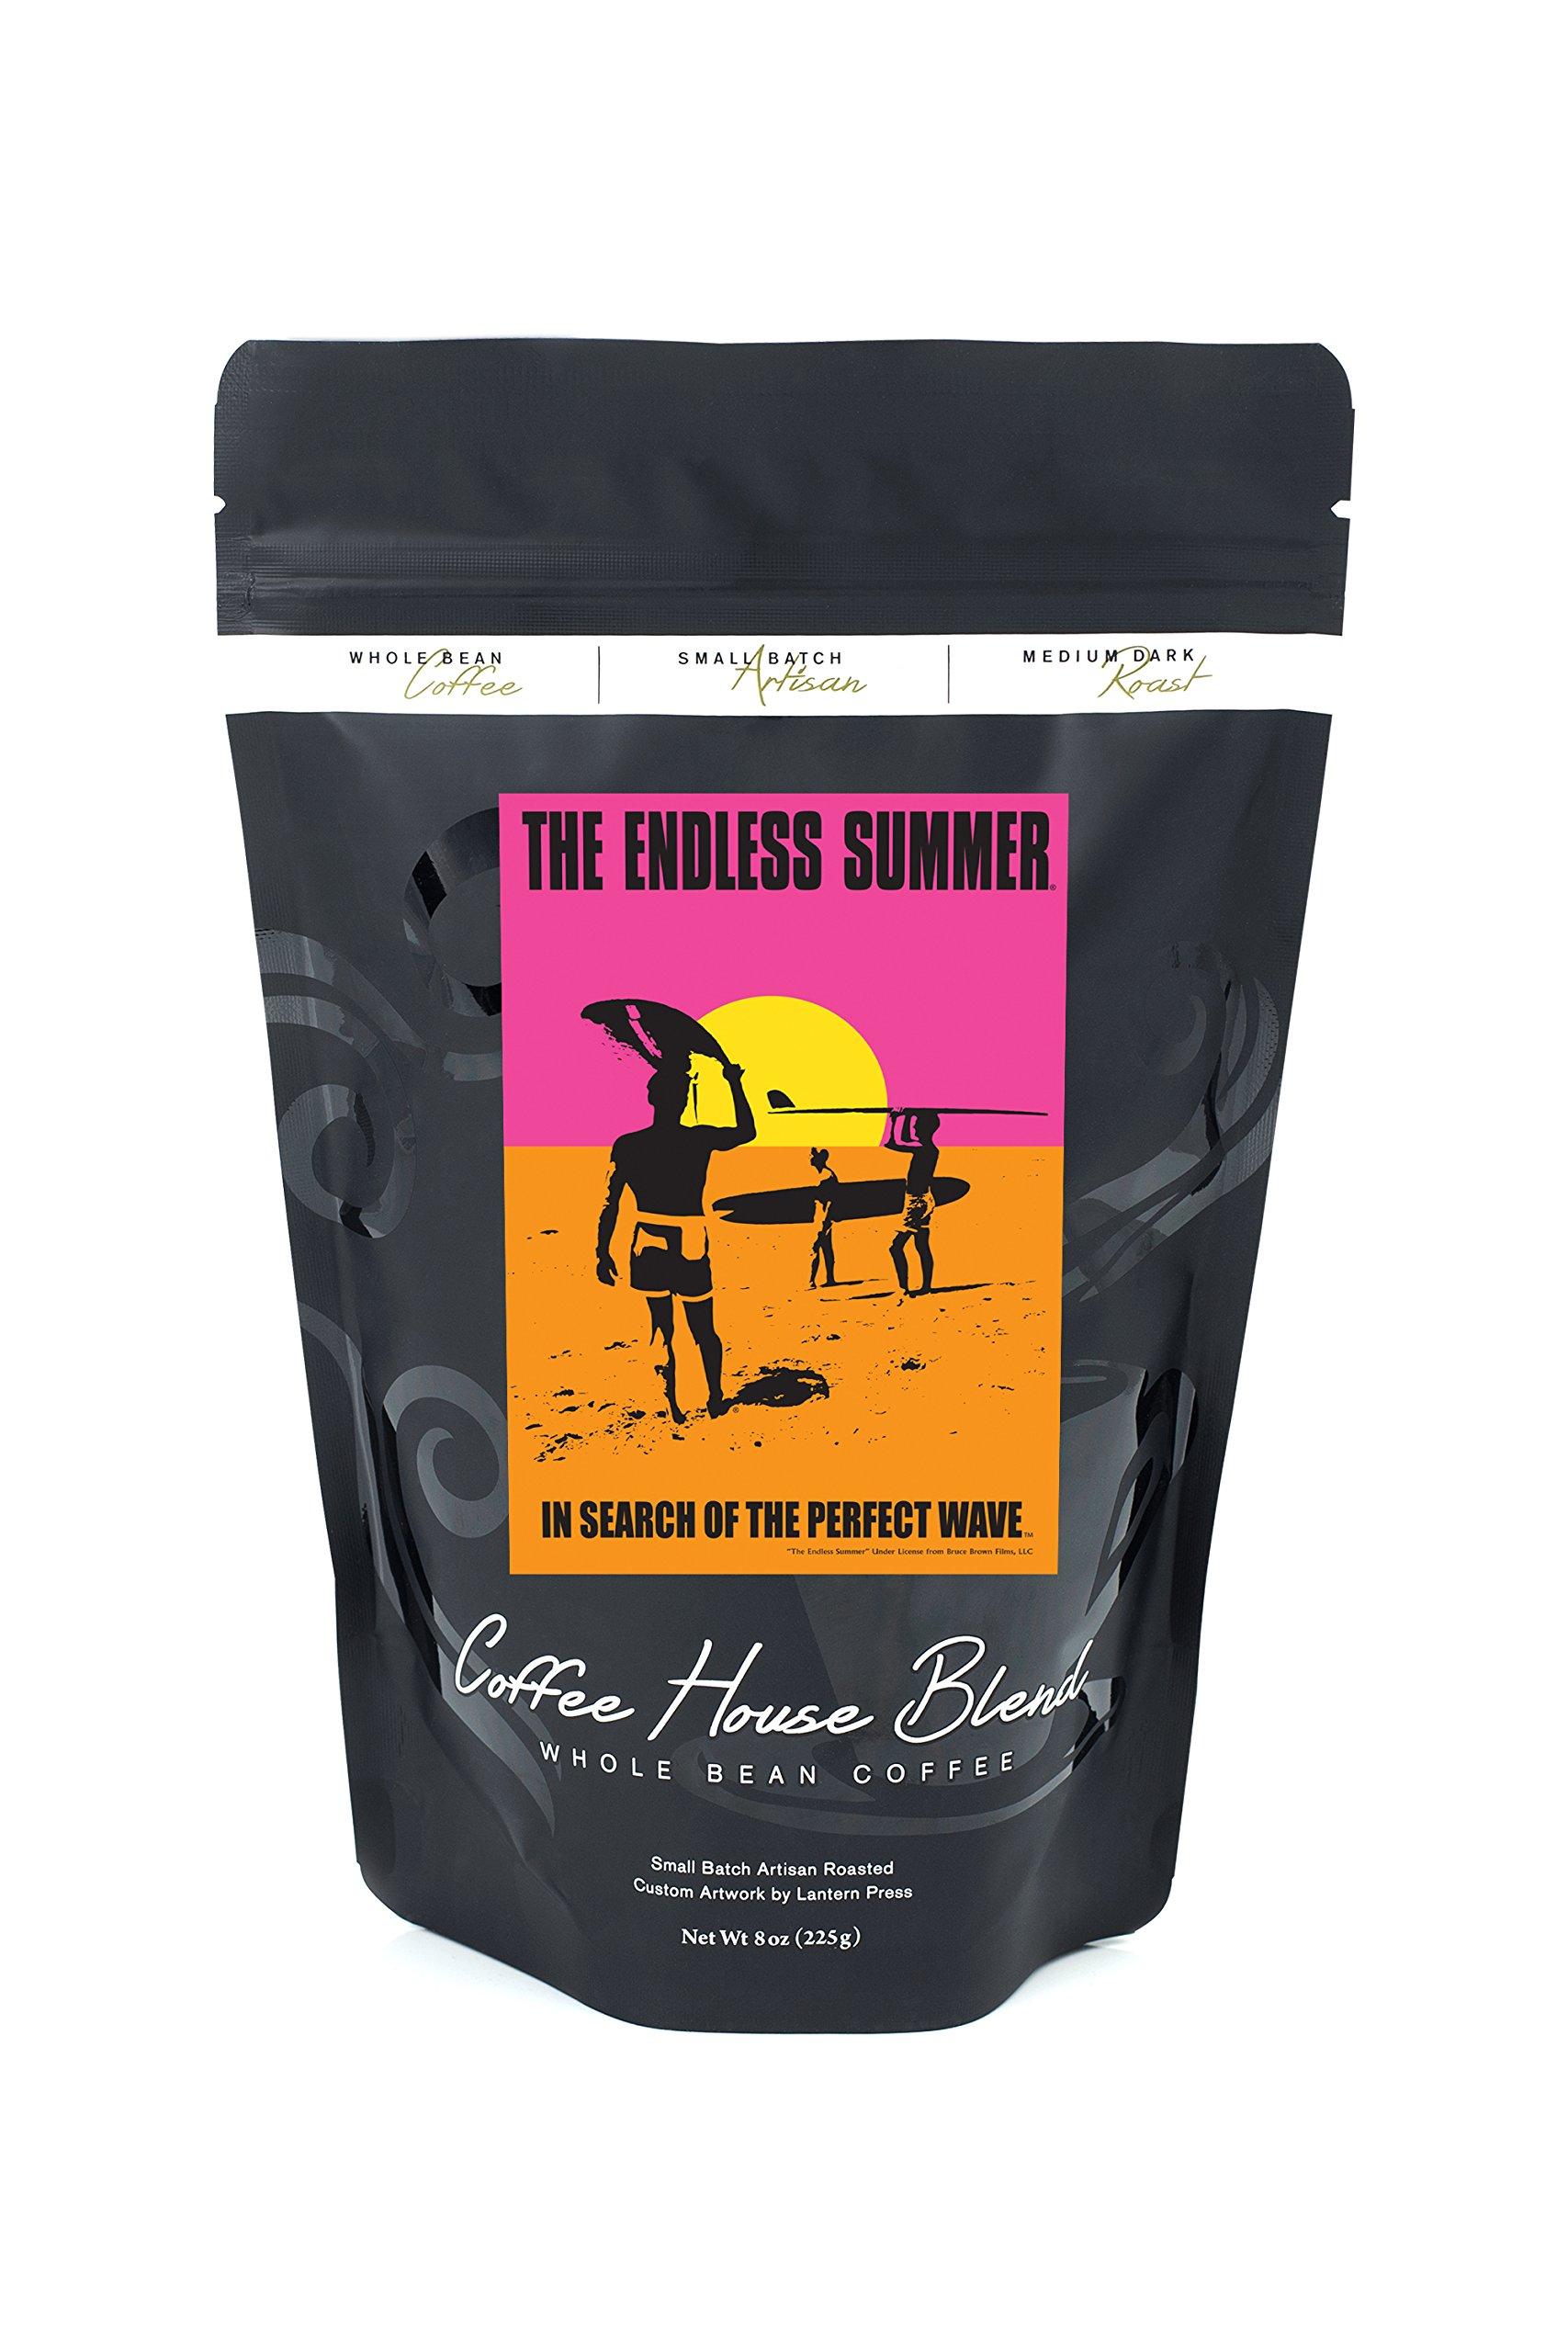 The Endless Summer - Original Movie Poster (8oz Whole Bean Small Batch Artisan Coffee - Bold & Strong Medium Dark Roast w/ Artwork)